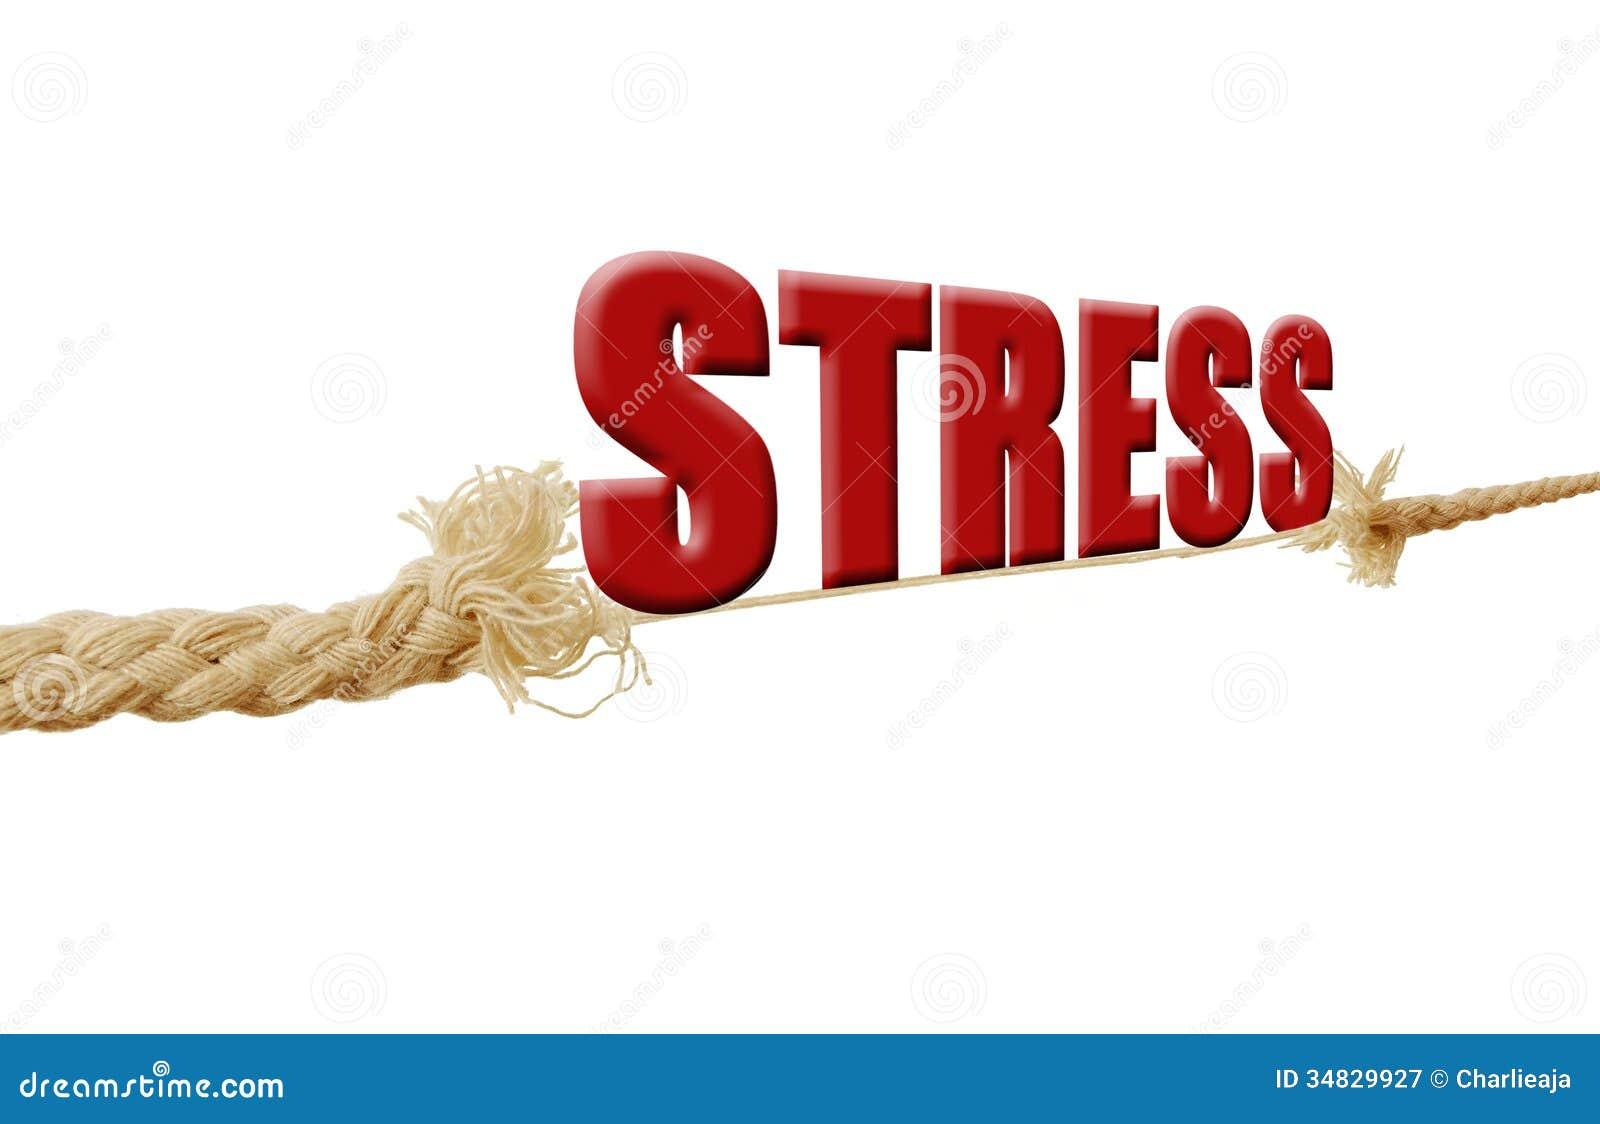 Stress Royalty Free Stock Photography - Image: 34829927